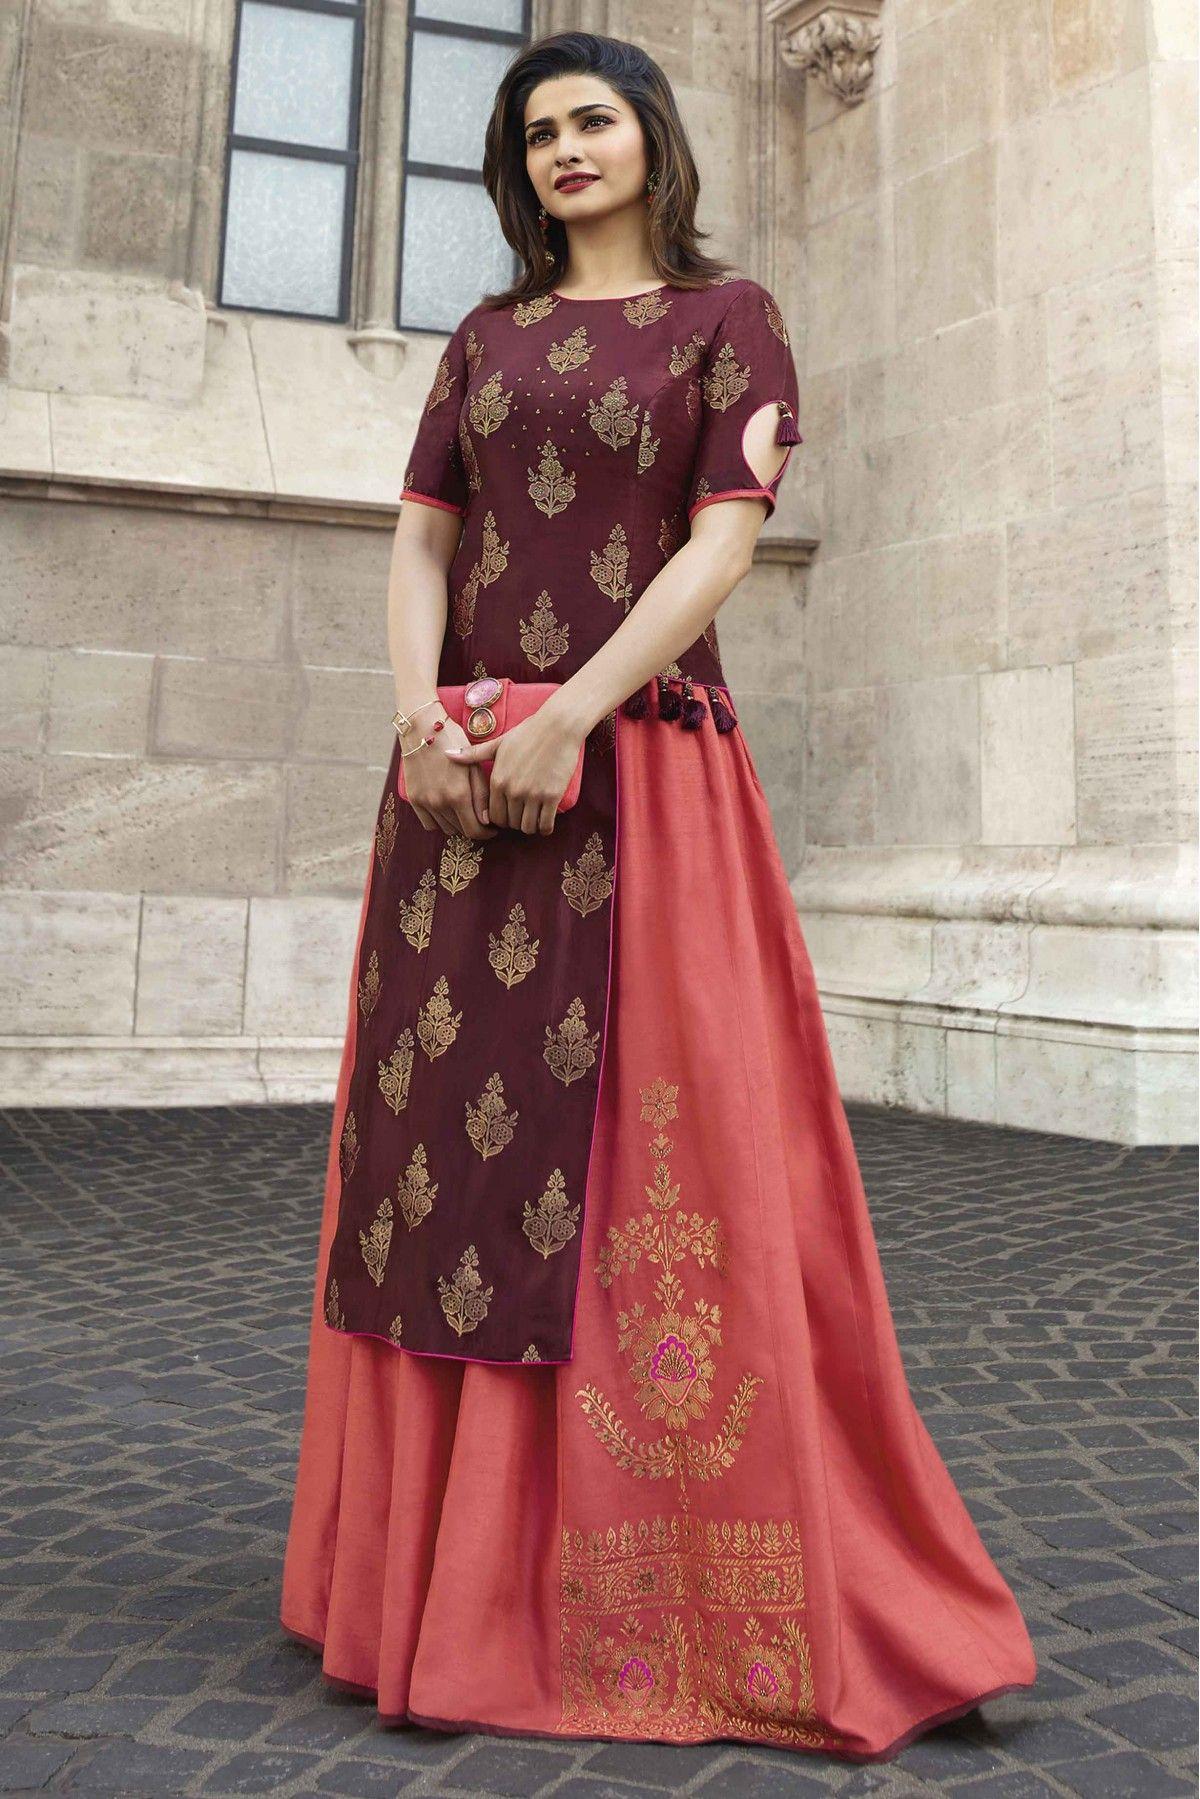 Prachi Desai Banarasi Jacquard And Satin Stone Work Kurti In Wine And Peach Colour Party Wear Maxi Dresses Designer Dresses Fancy Kurti